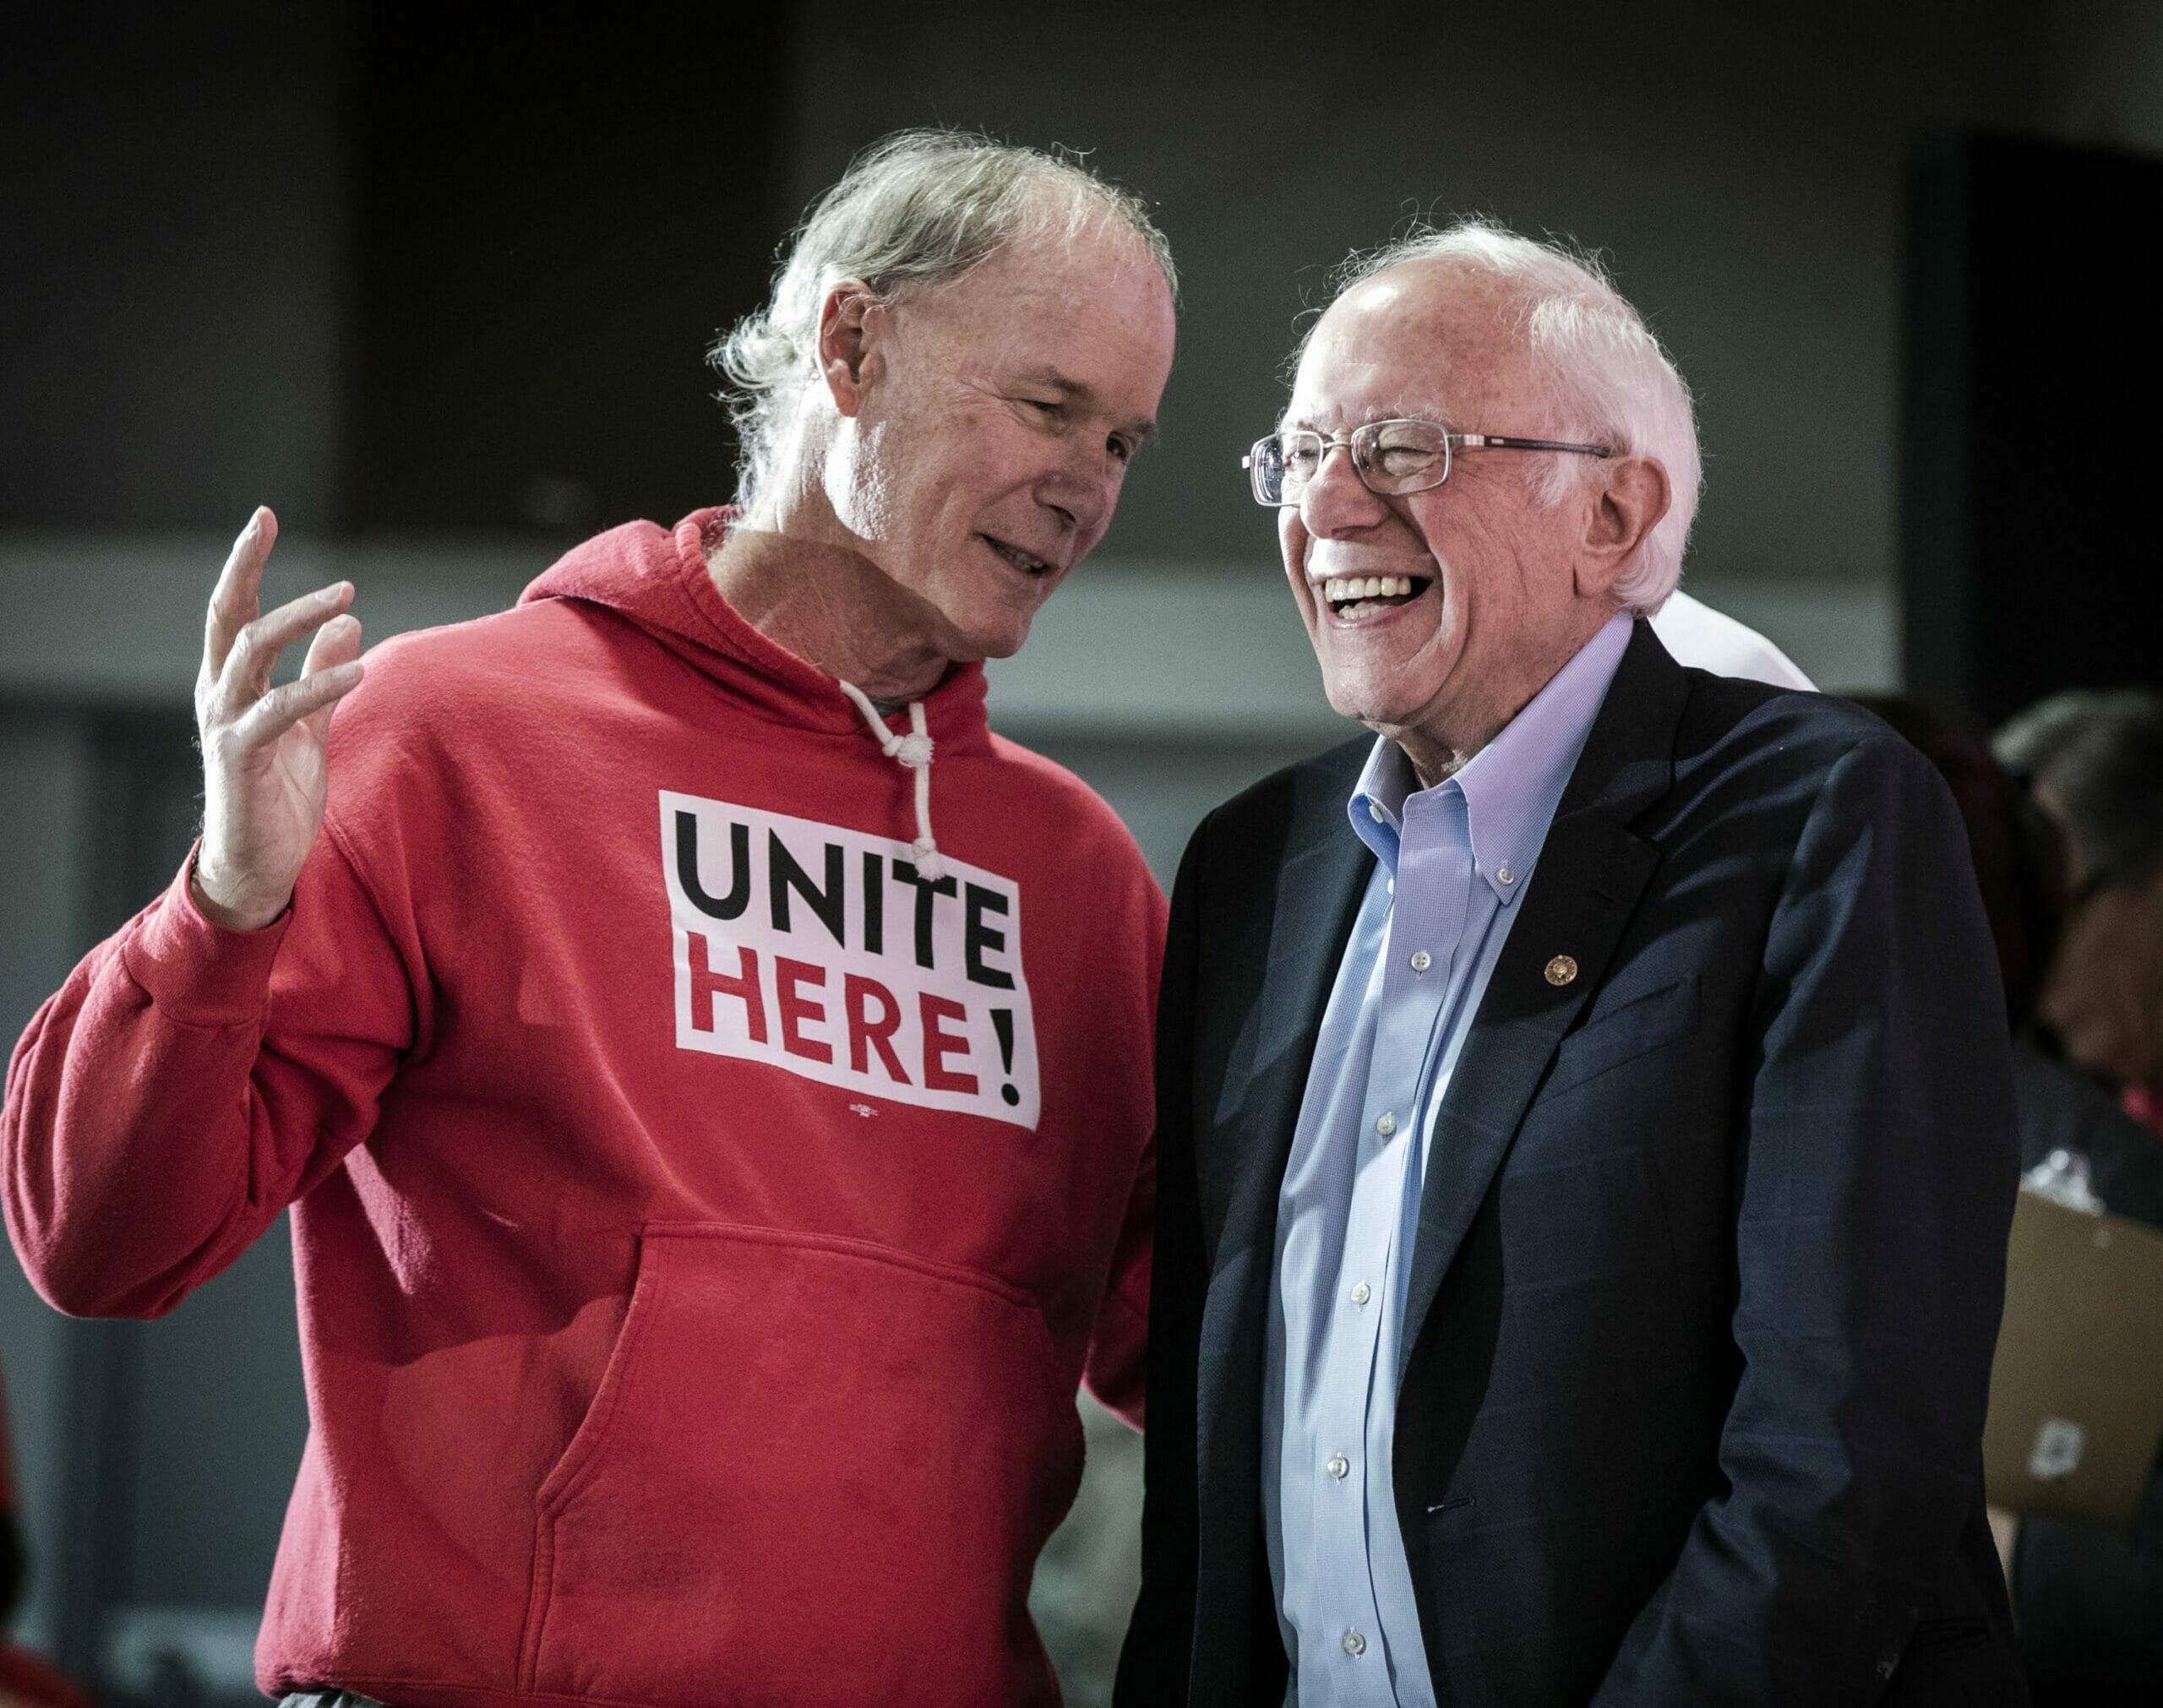 D. Taylor in a red Unite Here sweatshirt with Bernie Sanders in a dark suit jacket